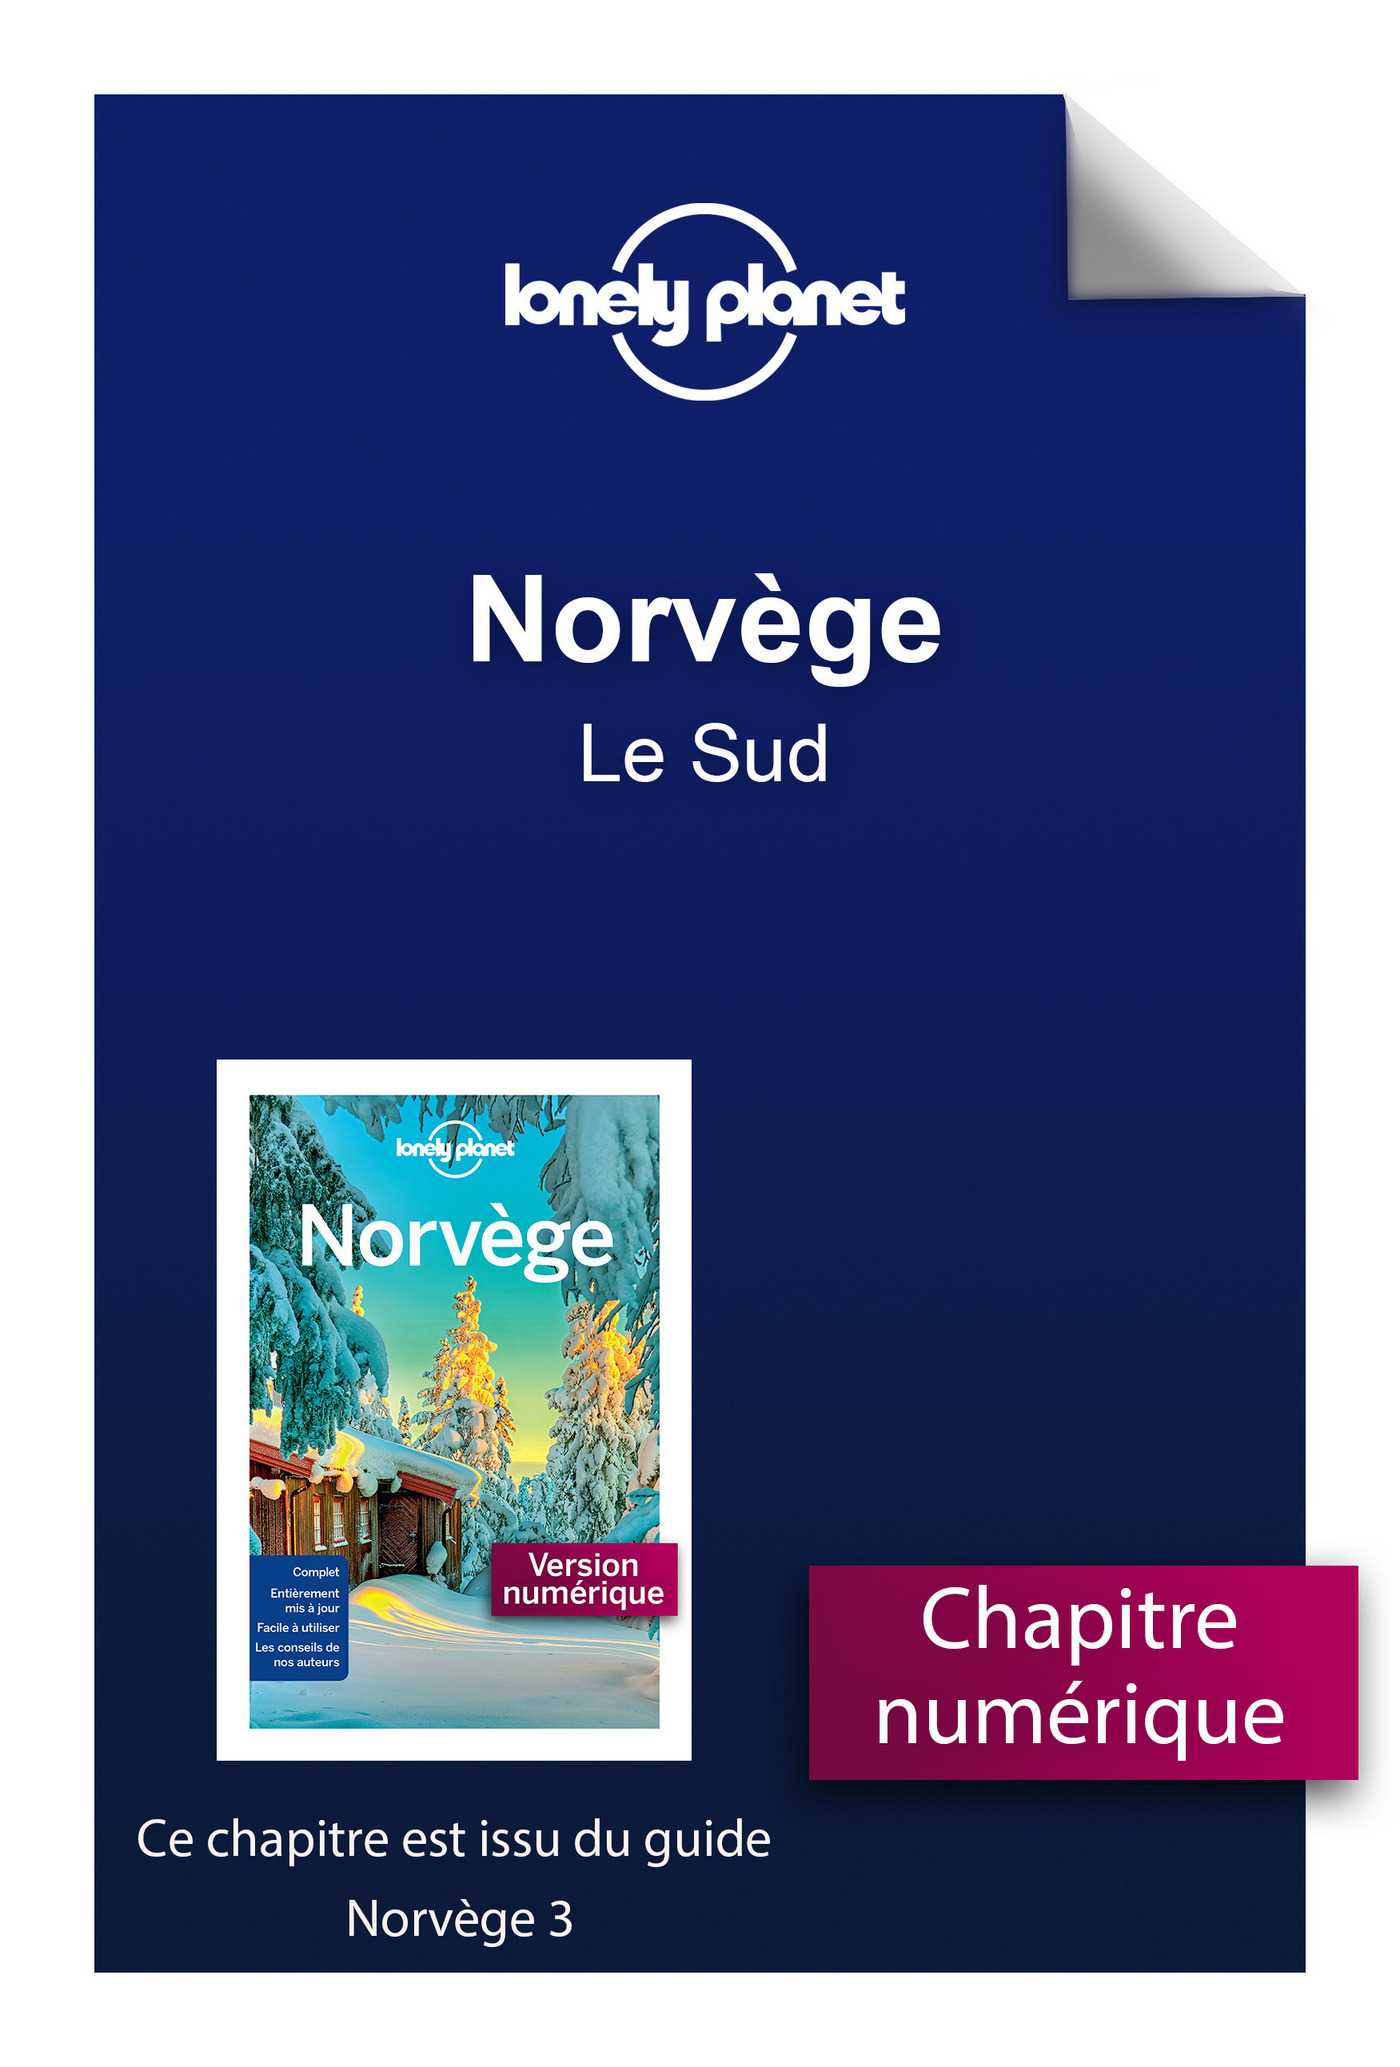 Norvège 3 - Le Sud